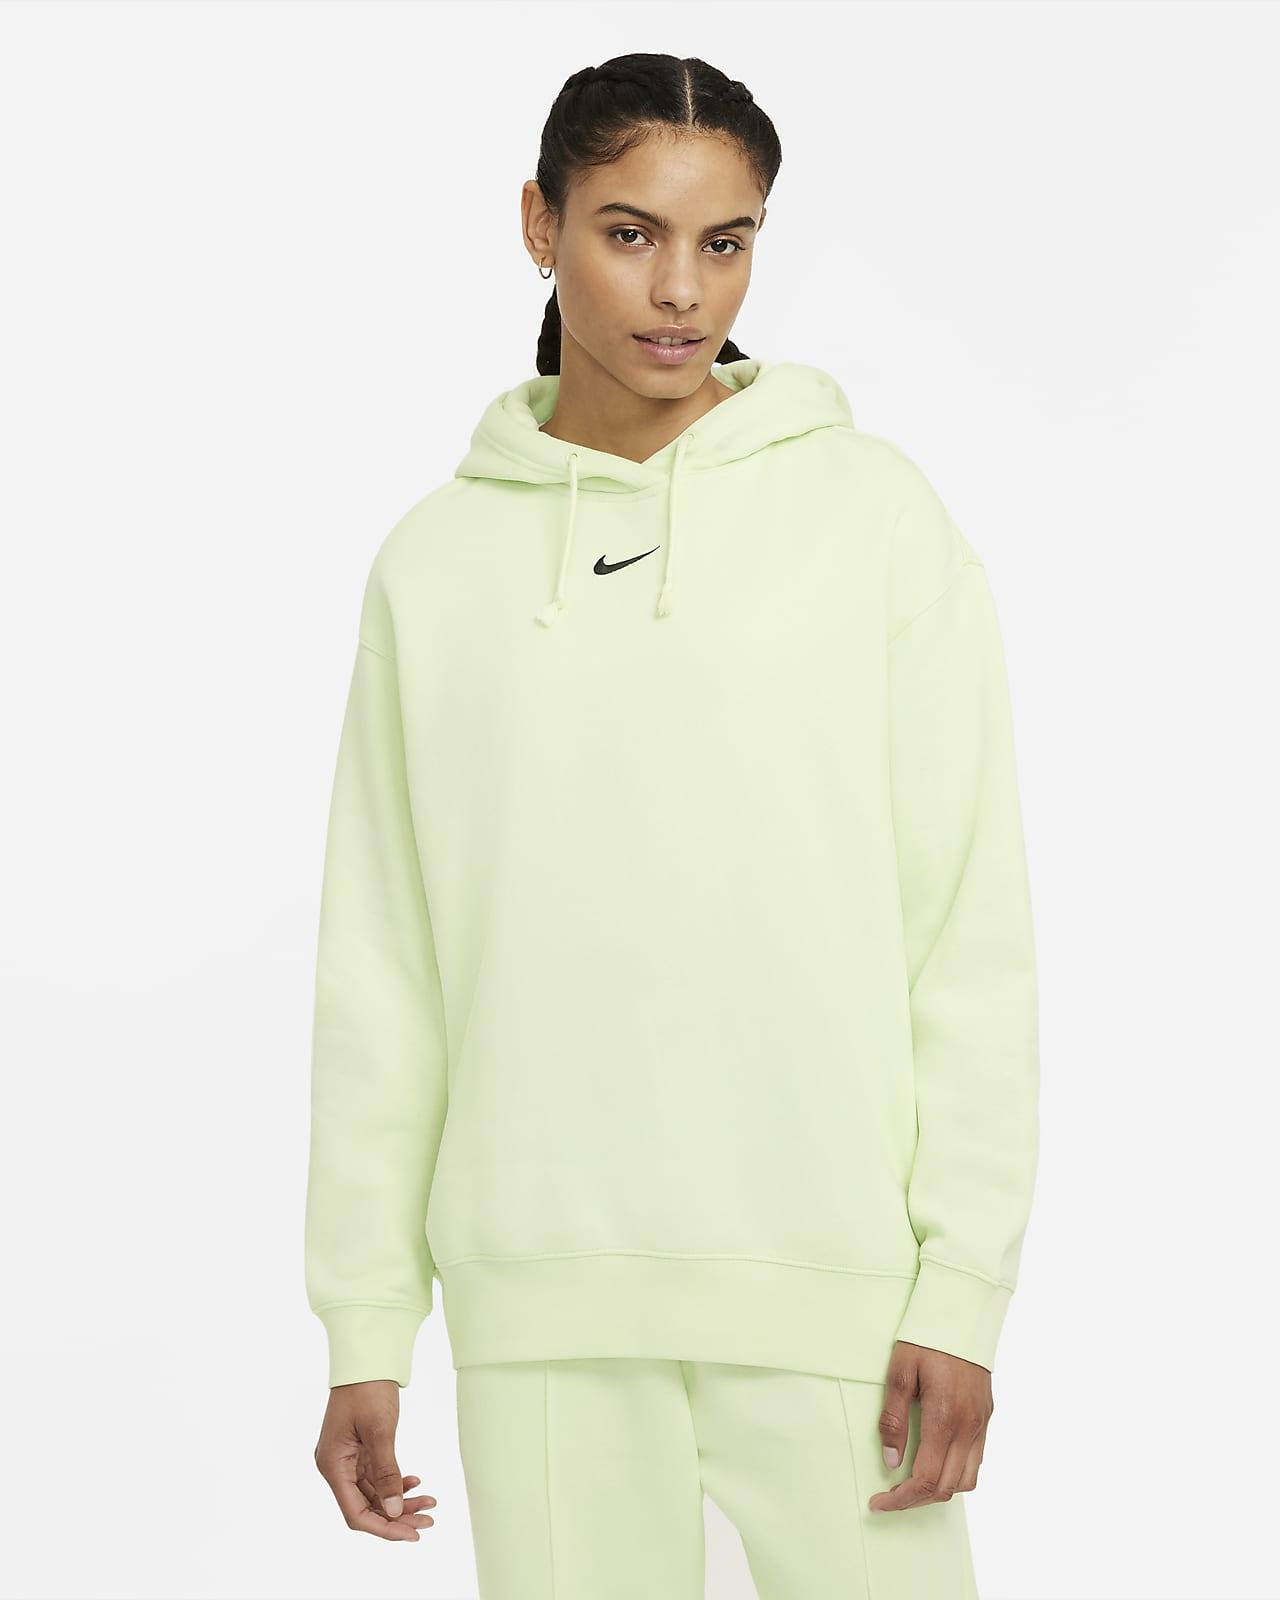 Женская флисовая худи оверсайз Nike Sportswear Essential Collection